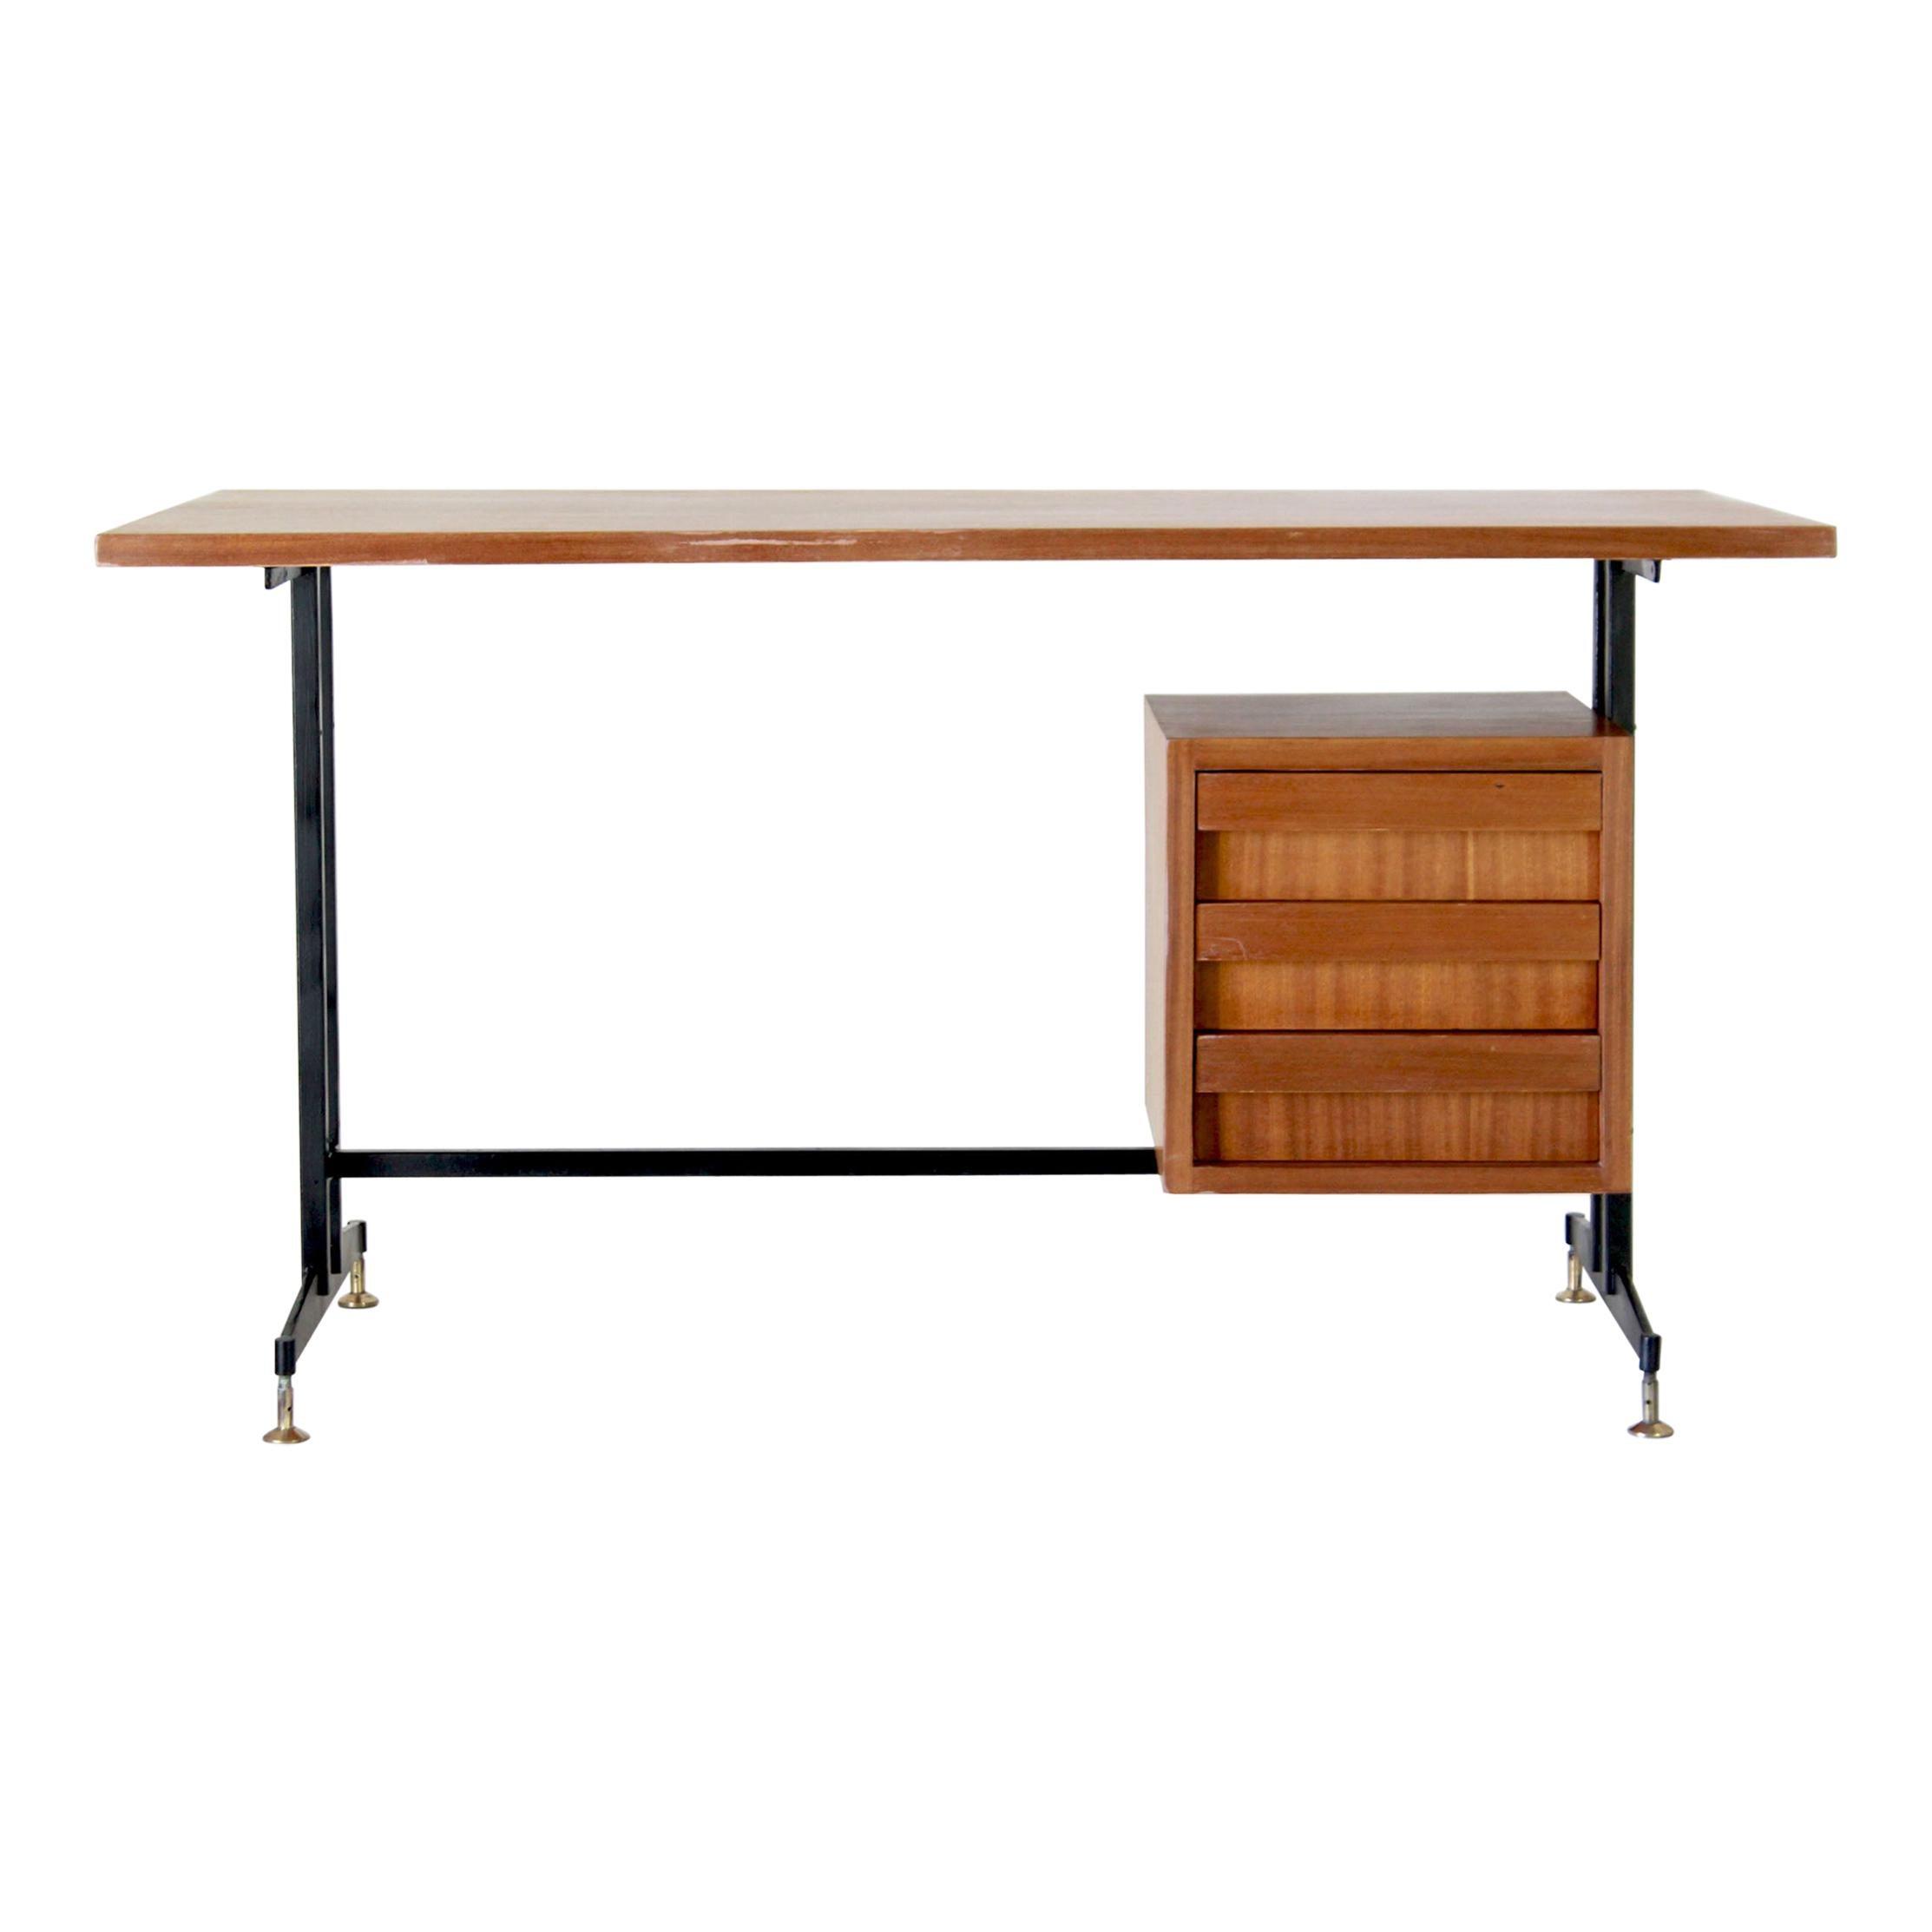 1950s Vintage Desk in Scandinavian Style